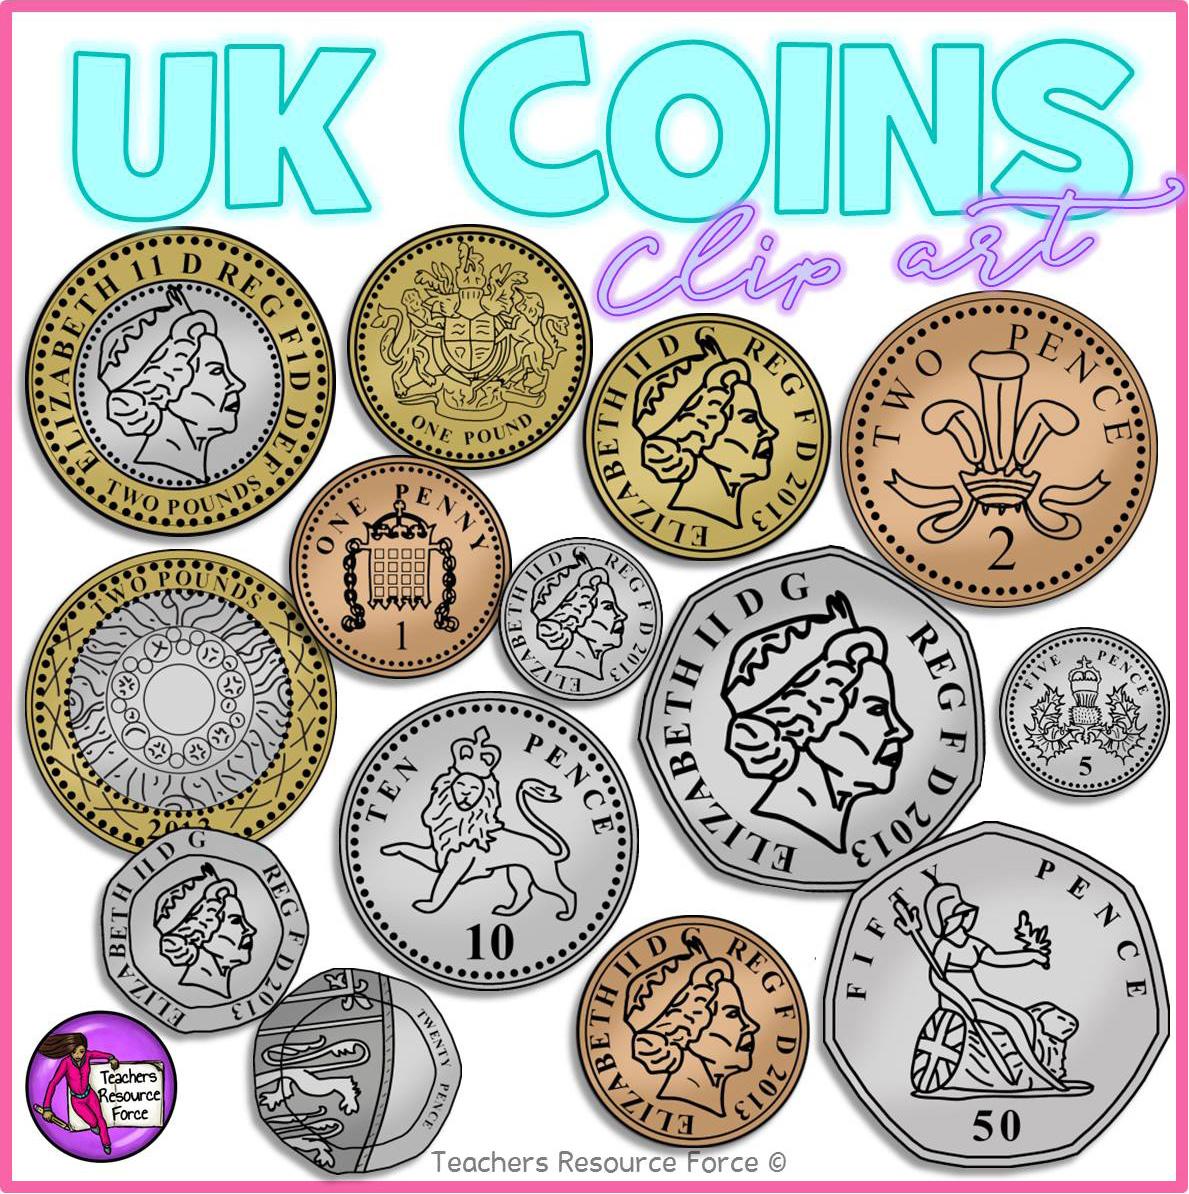 UK Coins Clip Art.